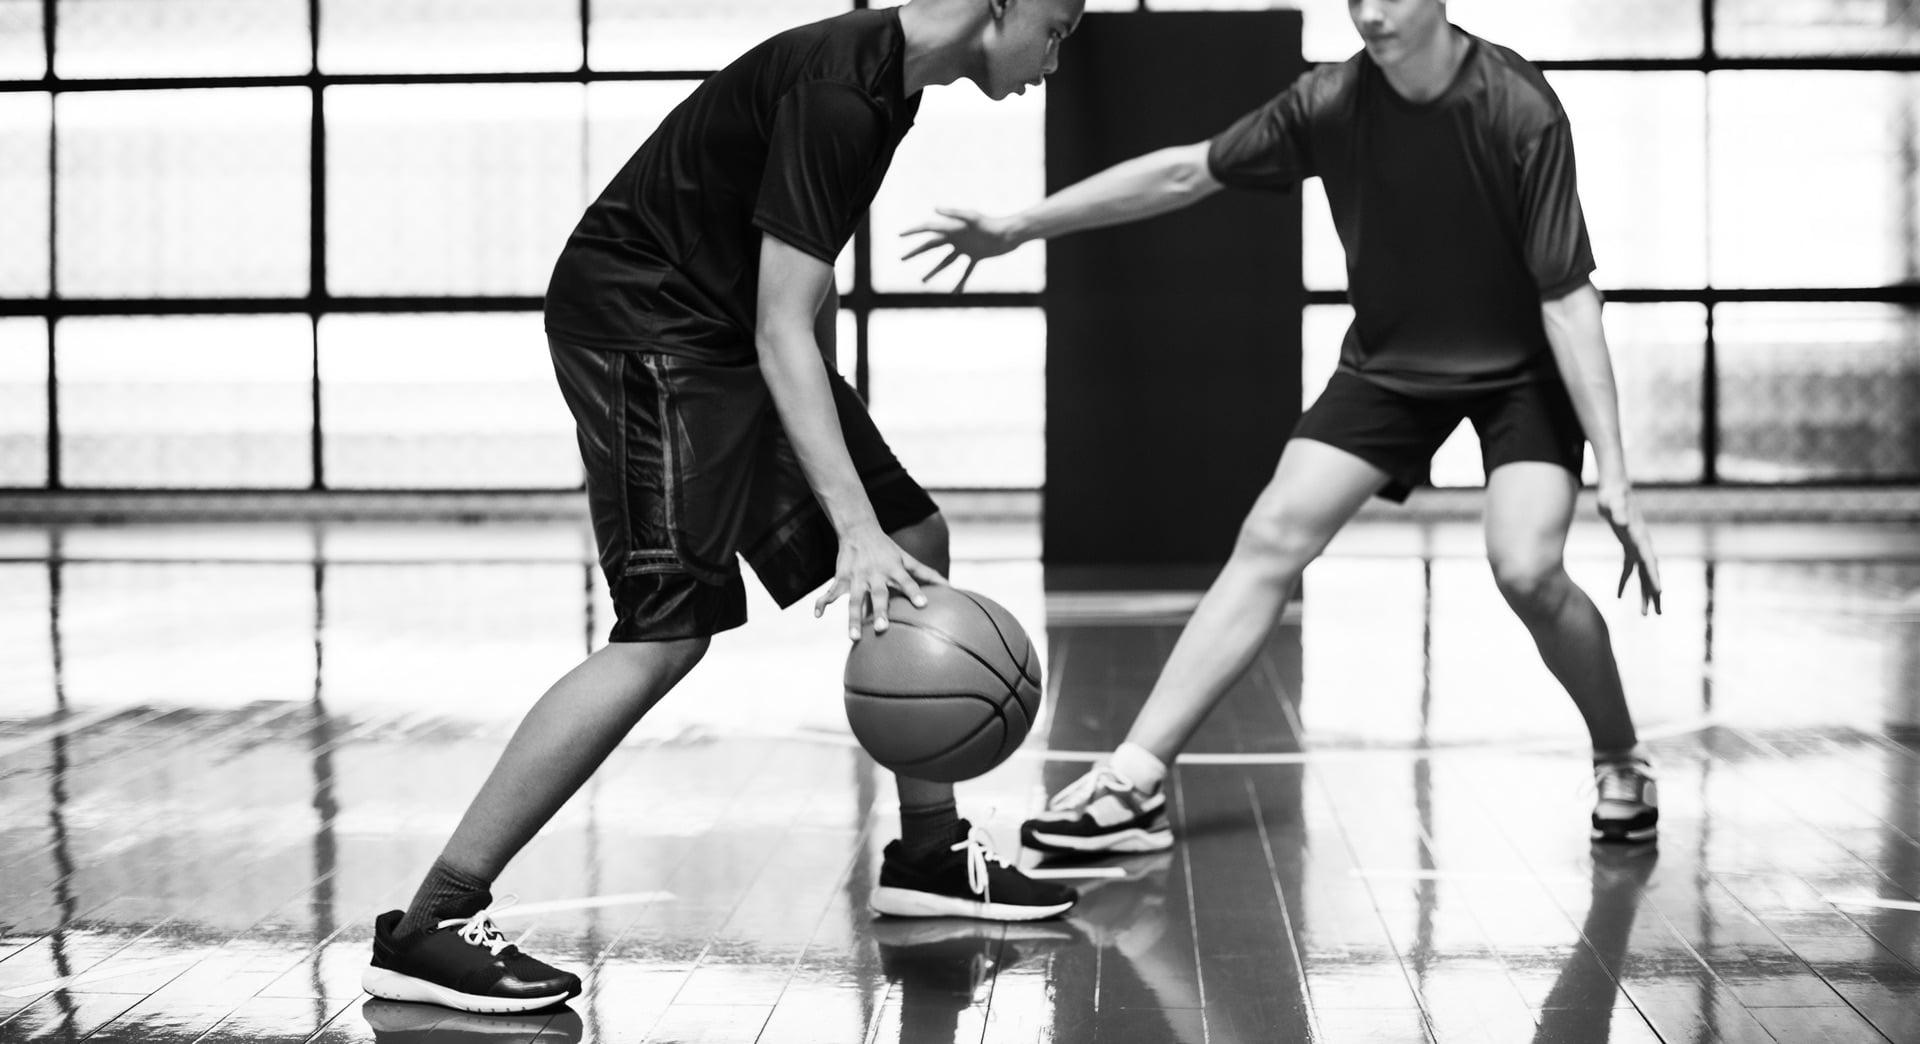 The London Basketball Association